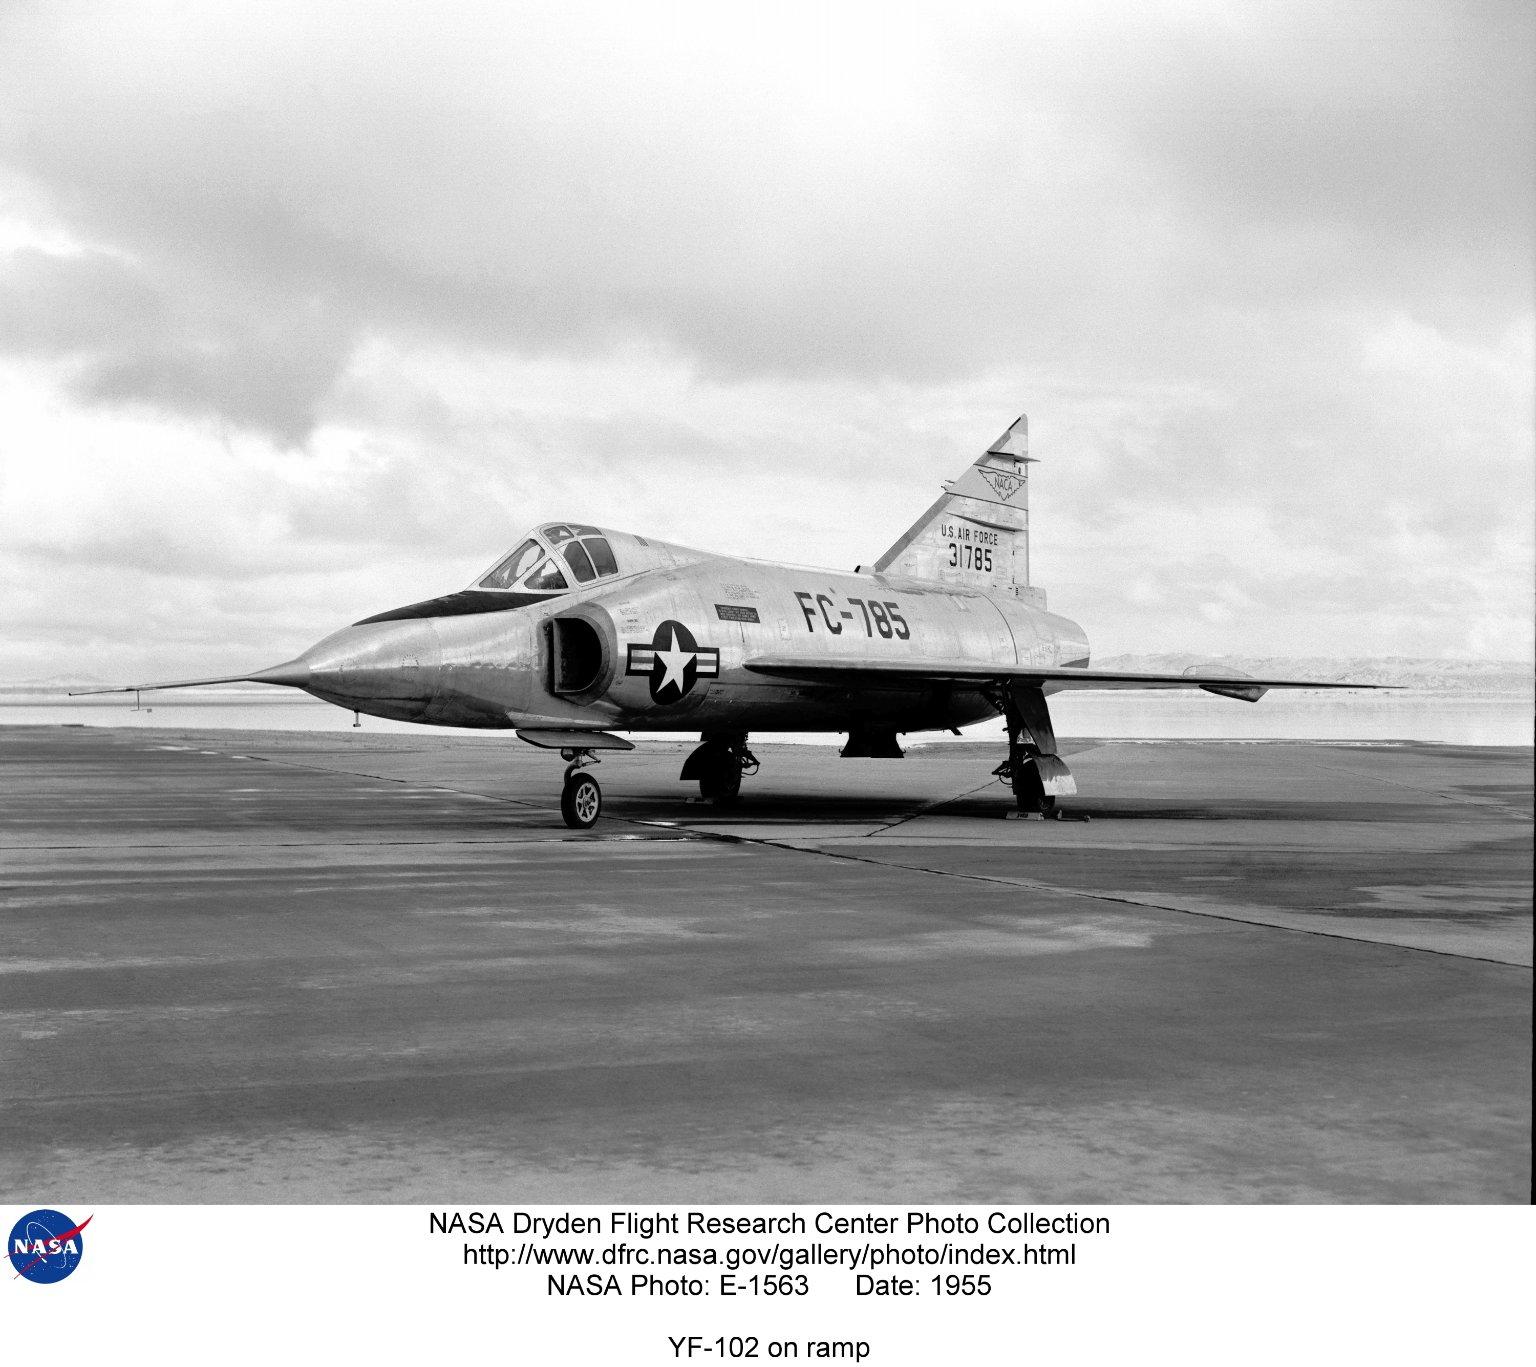 YF-102 on ramp